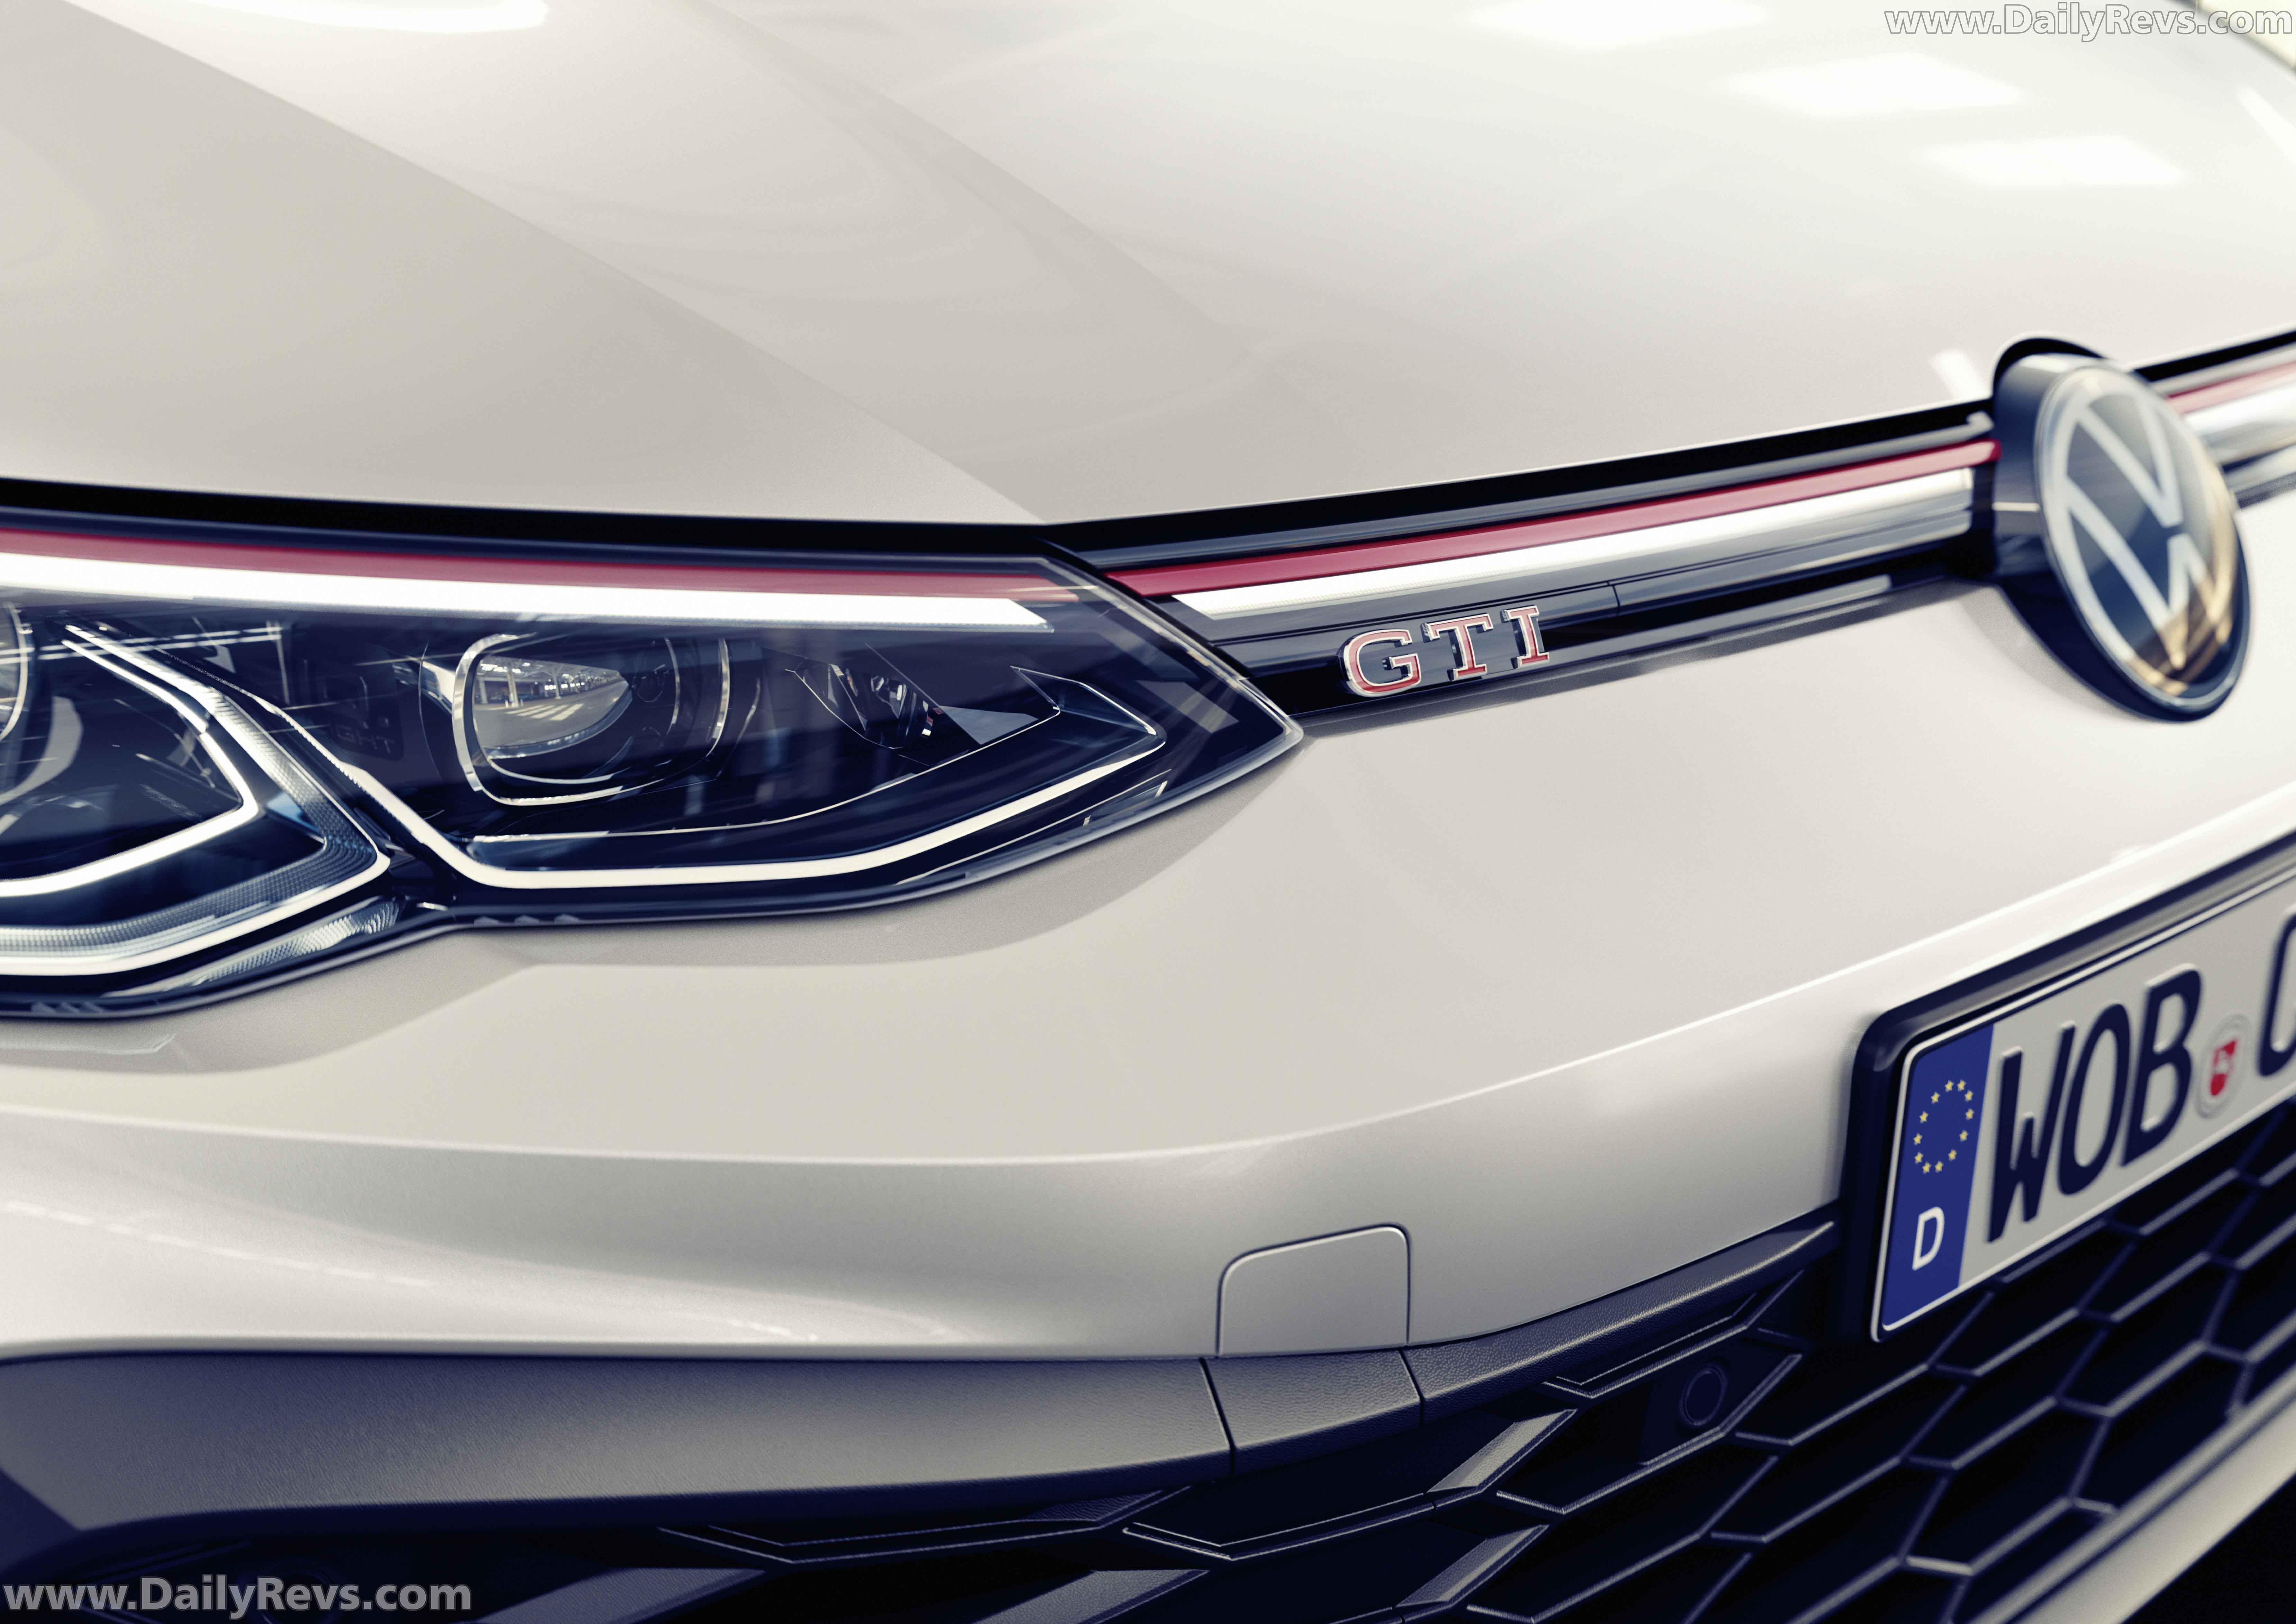 2021 Volkswagen Golf GTI Clubsport full